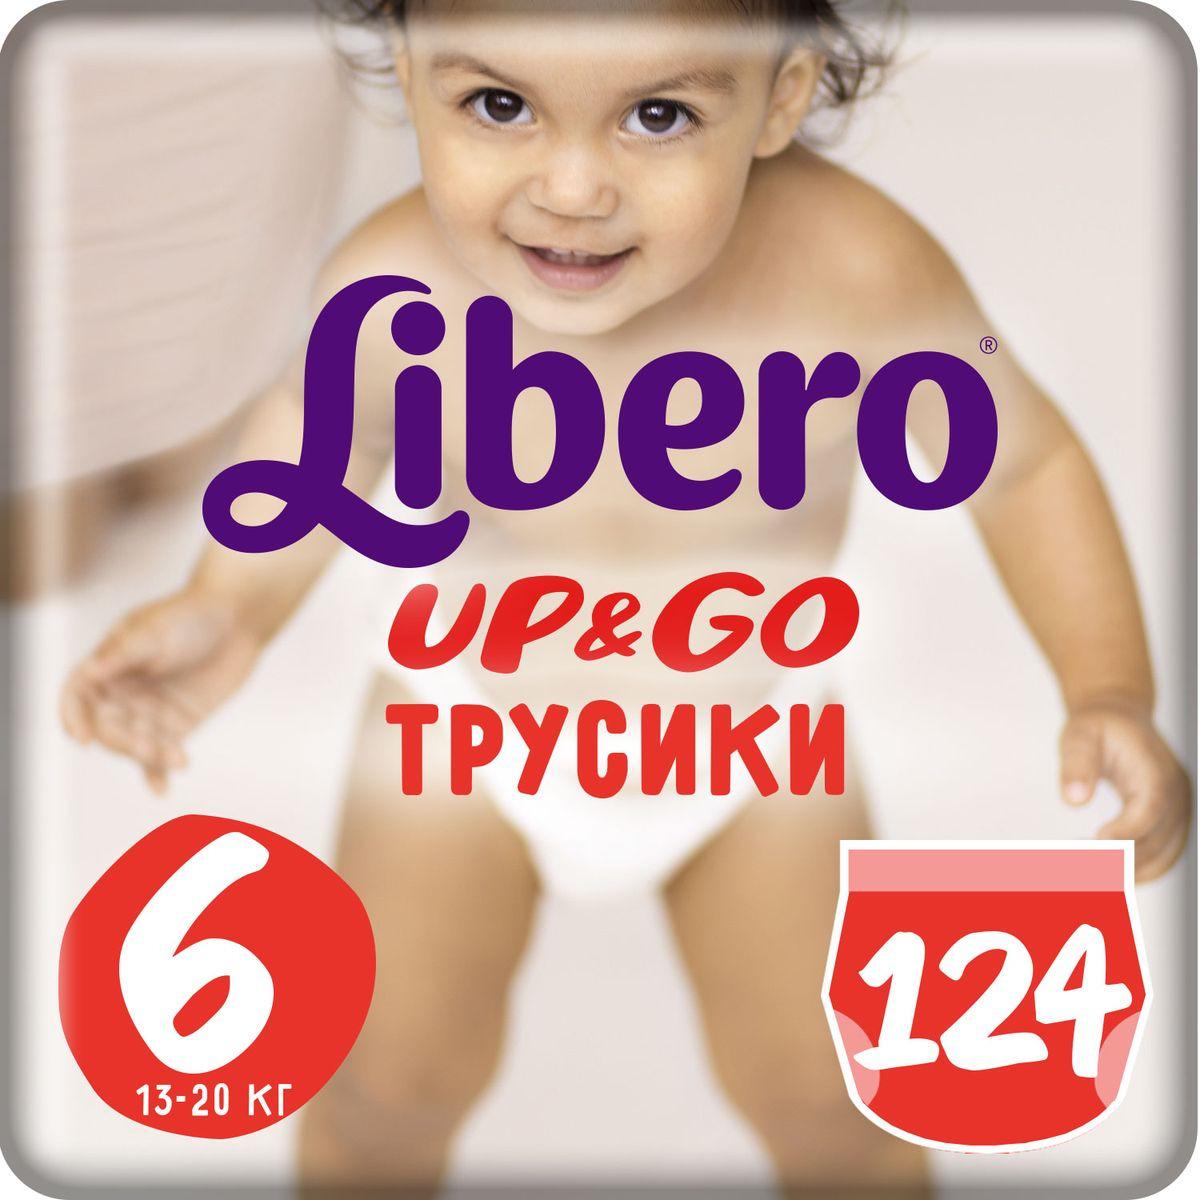 Трусики Libero Up&Go 6, 13-20 кг, 124 шт